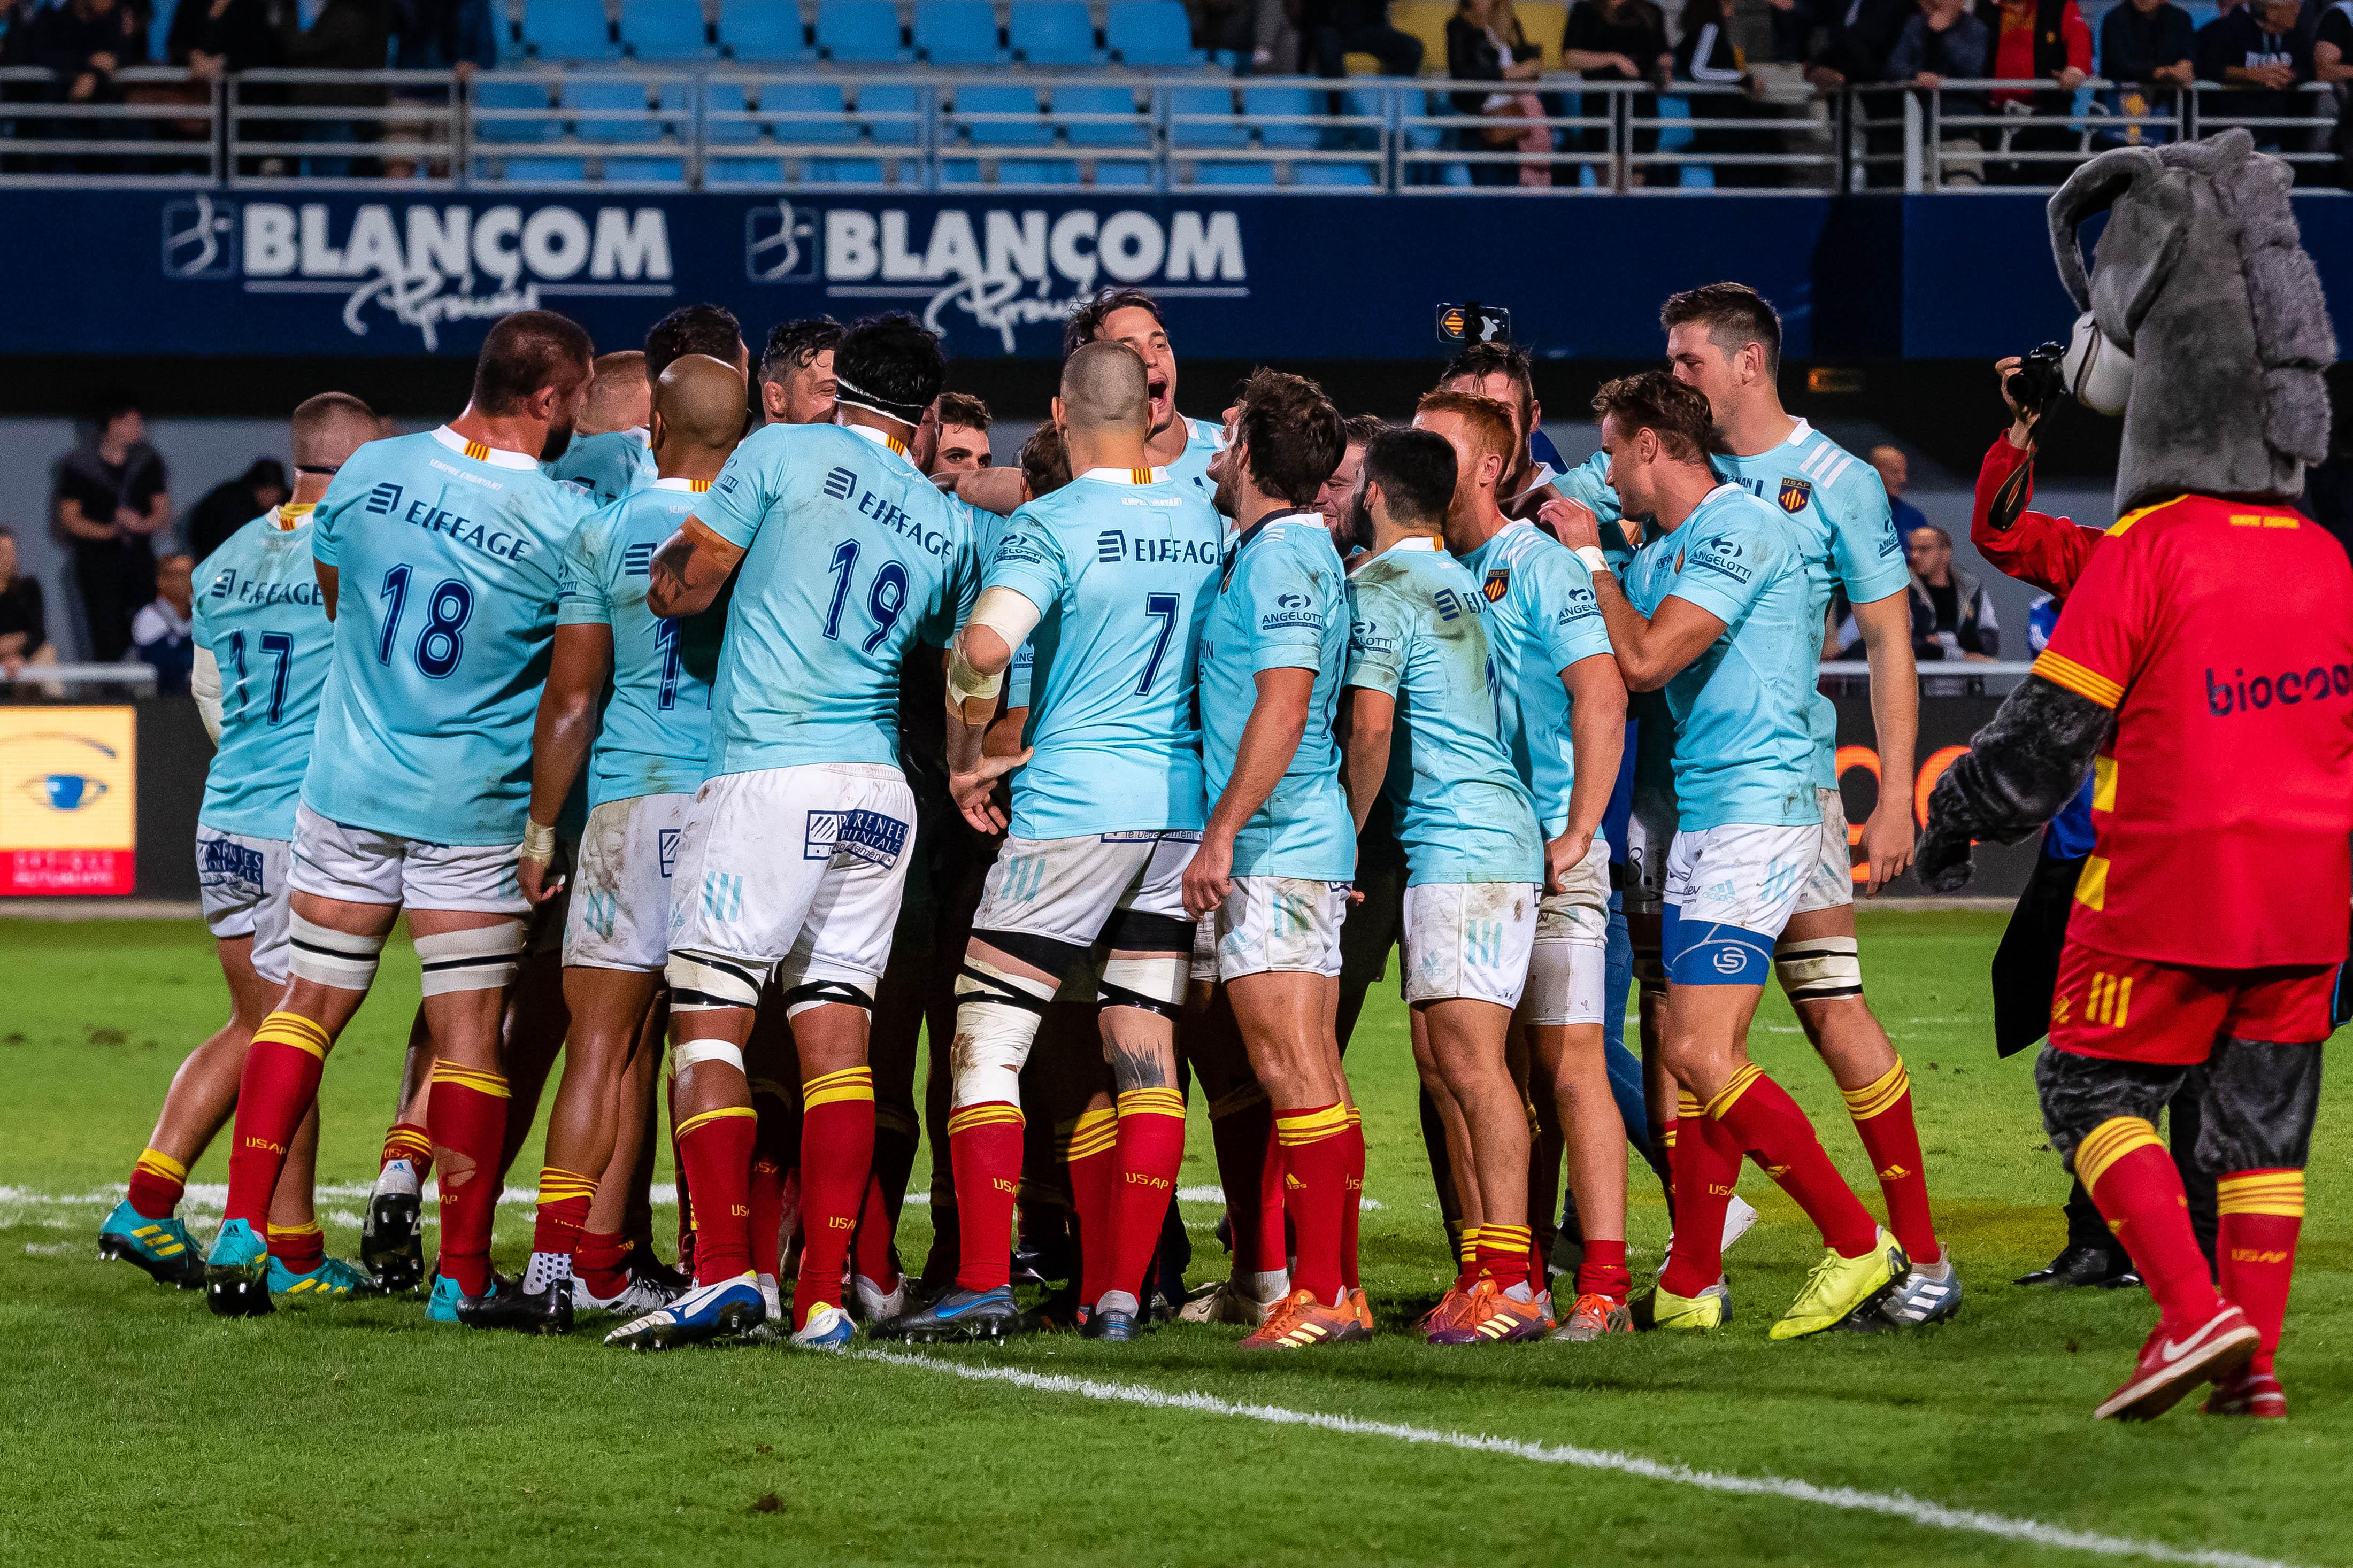 Ecole de rugby : sempre en davant !